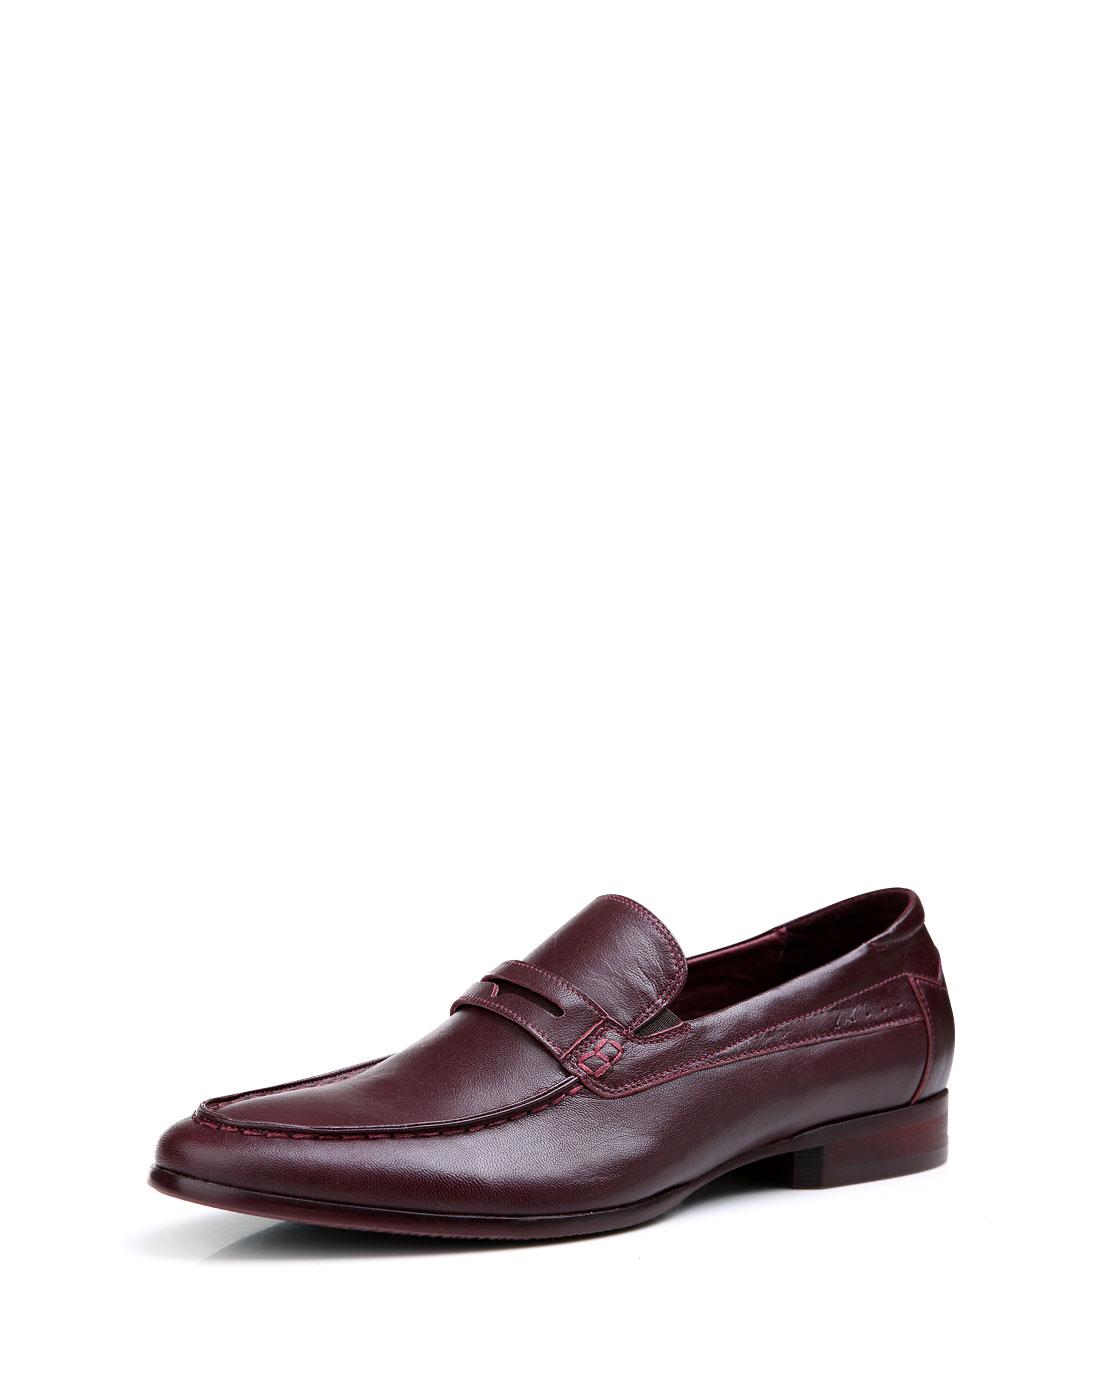 mr.ing 酒红真皮鞋